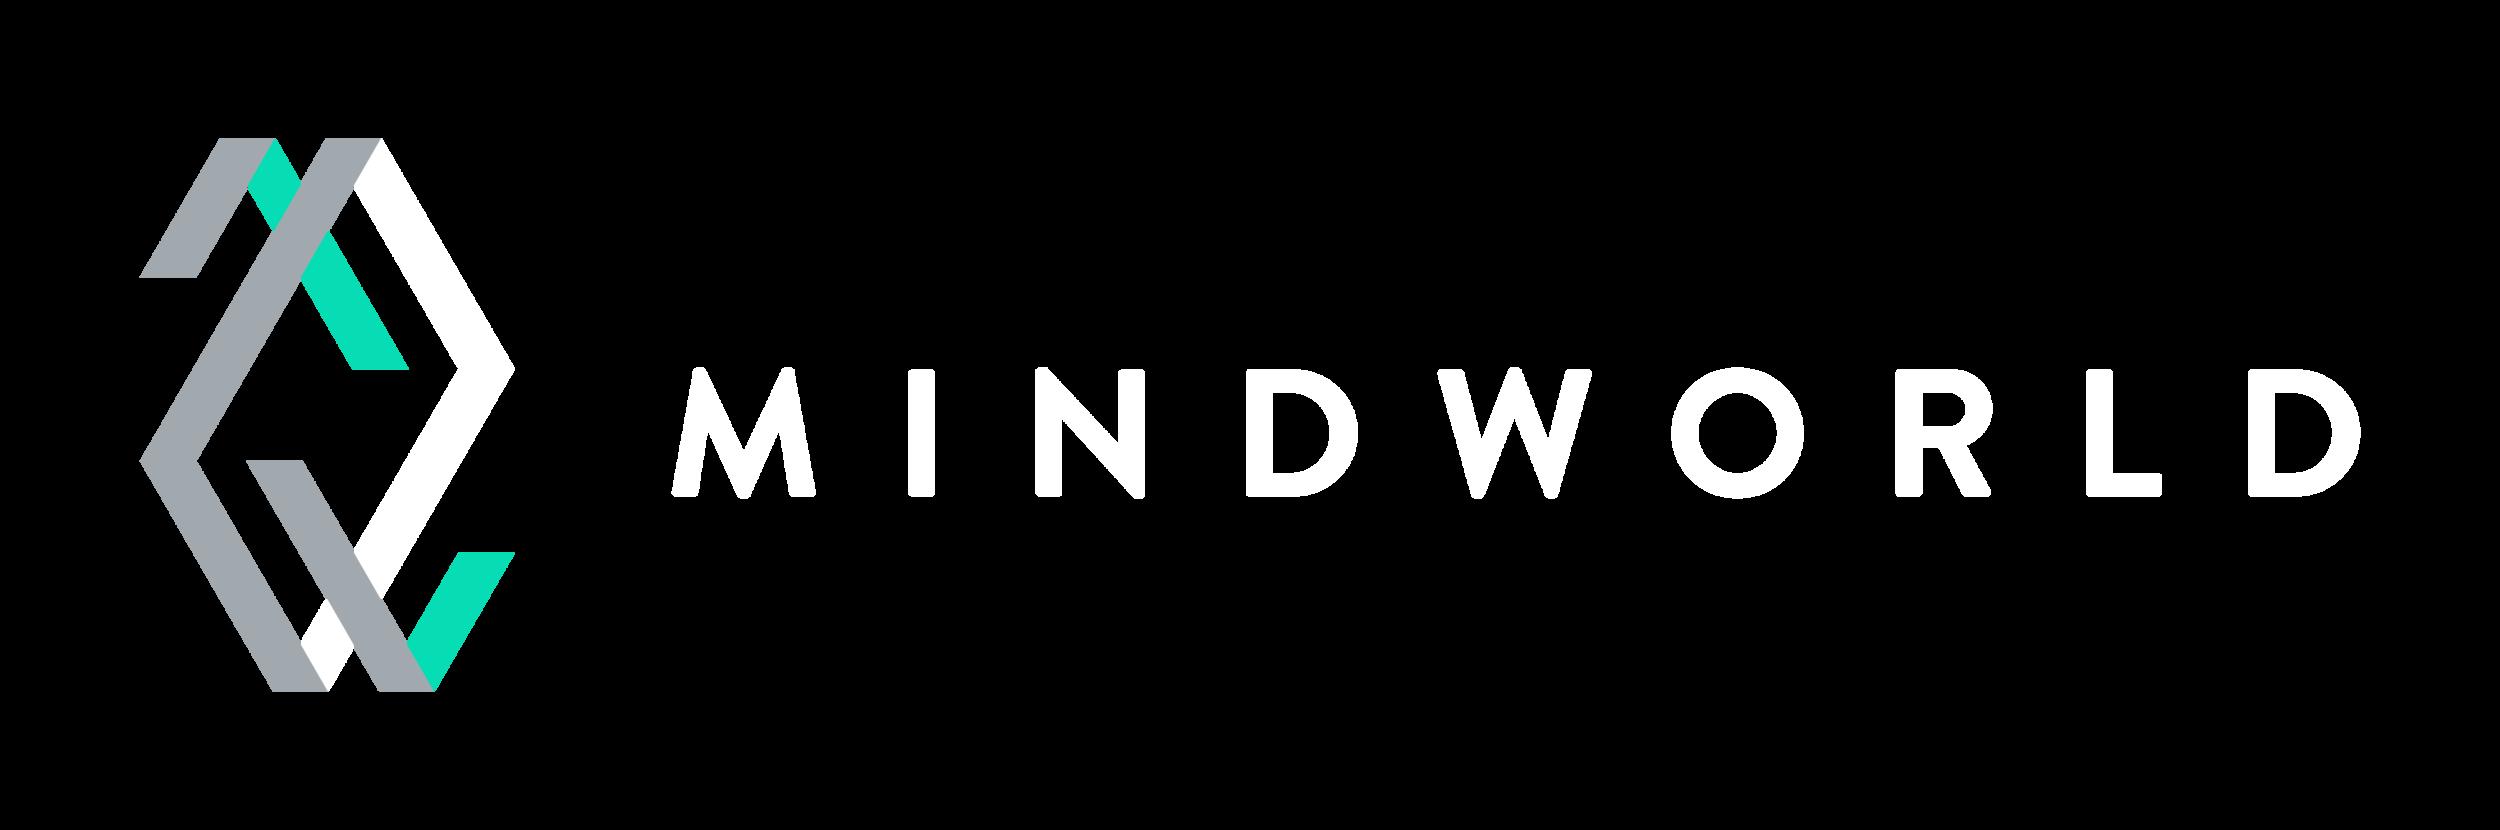 MW Logo 02 Main.png